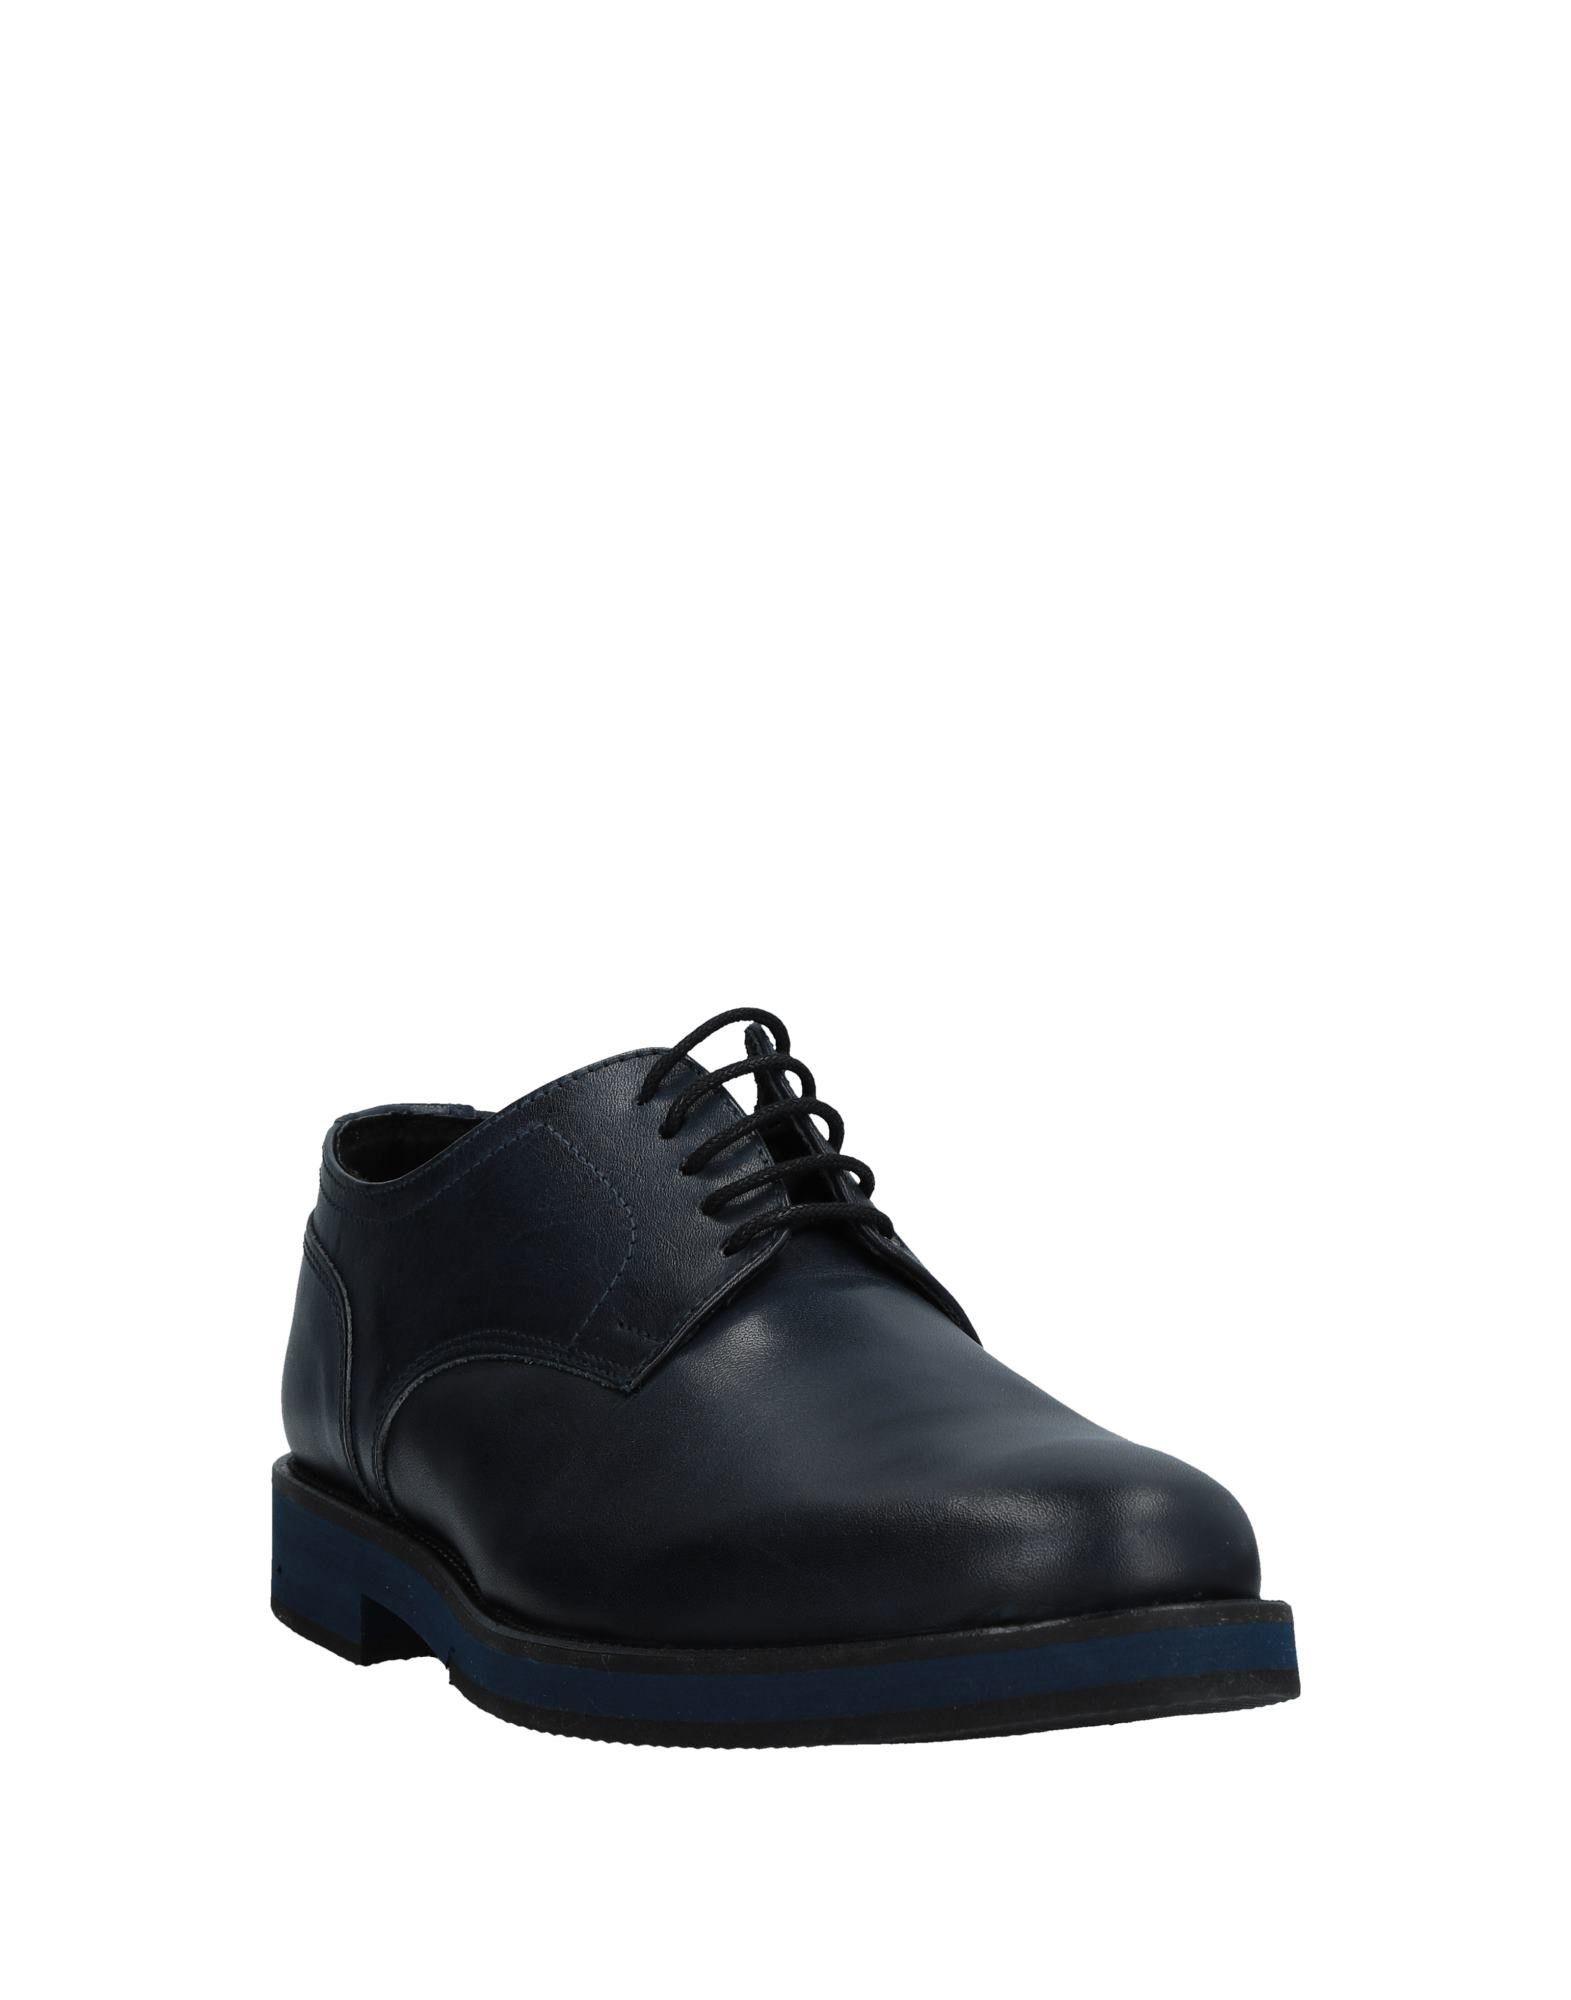 Rabatt echte Schuhe 11527543OU Drudd Schnürschuhe Herren  11527543OU Schuhe 7123cf